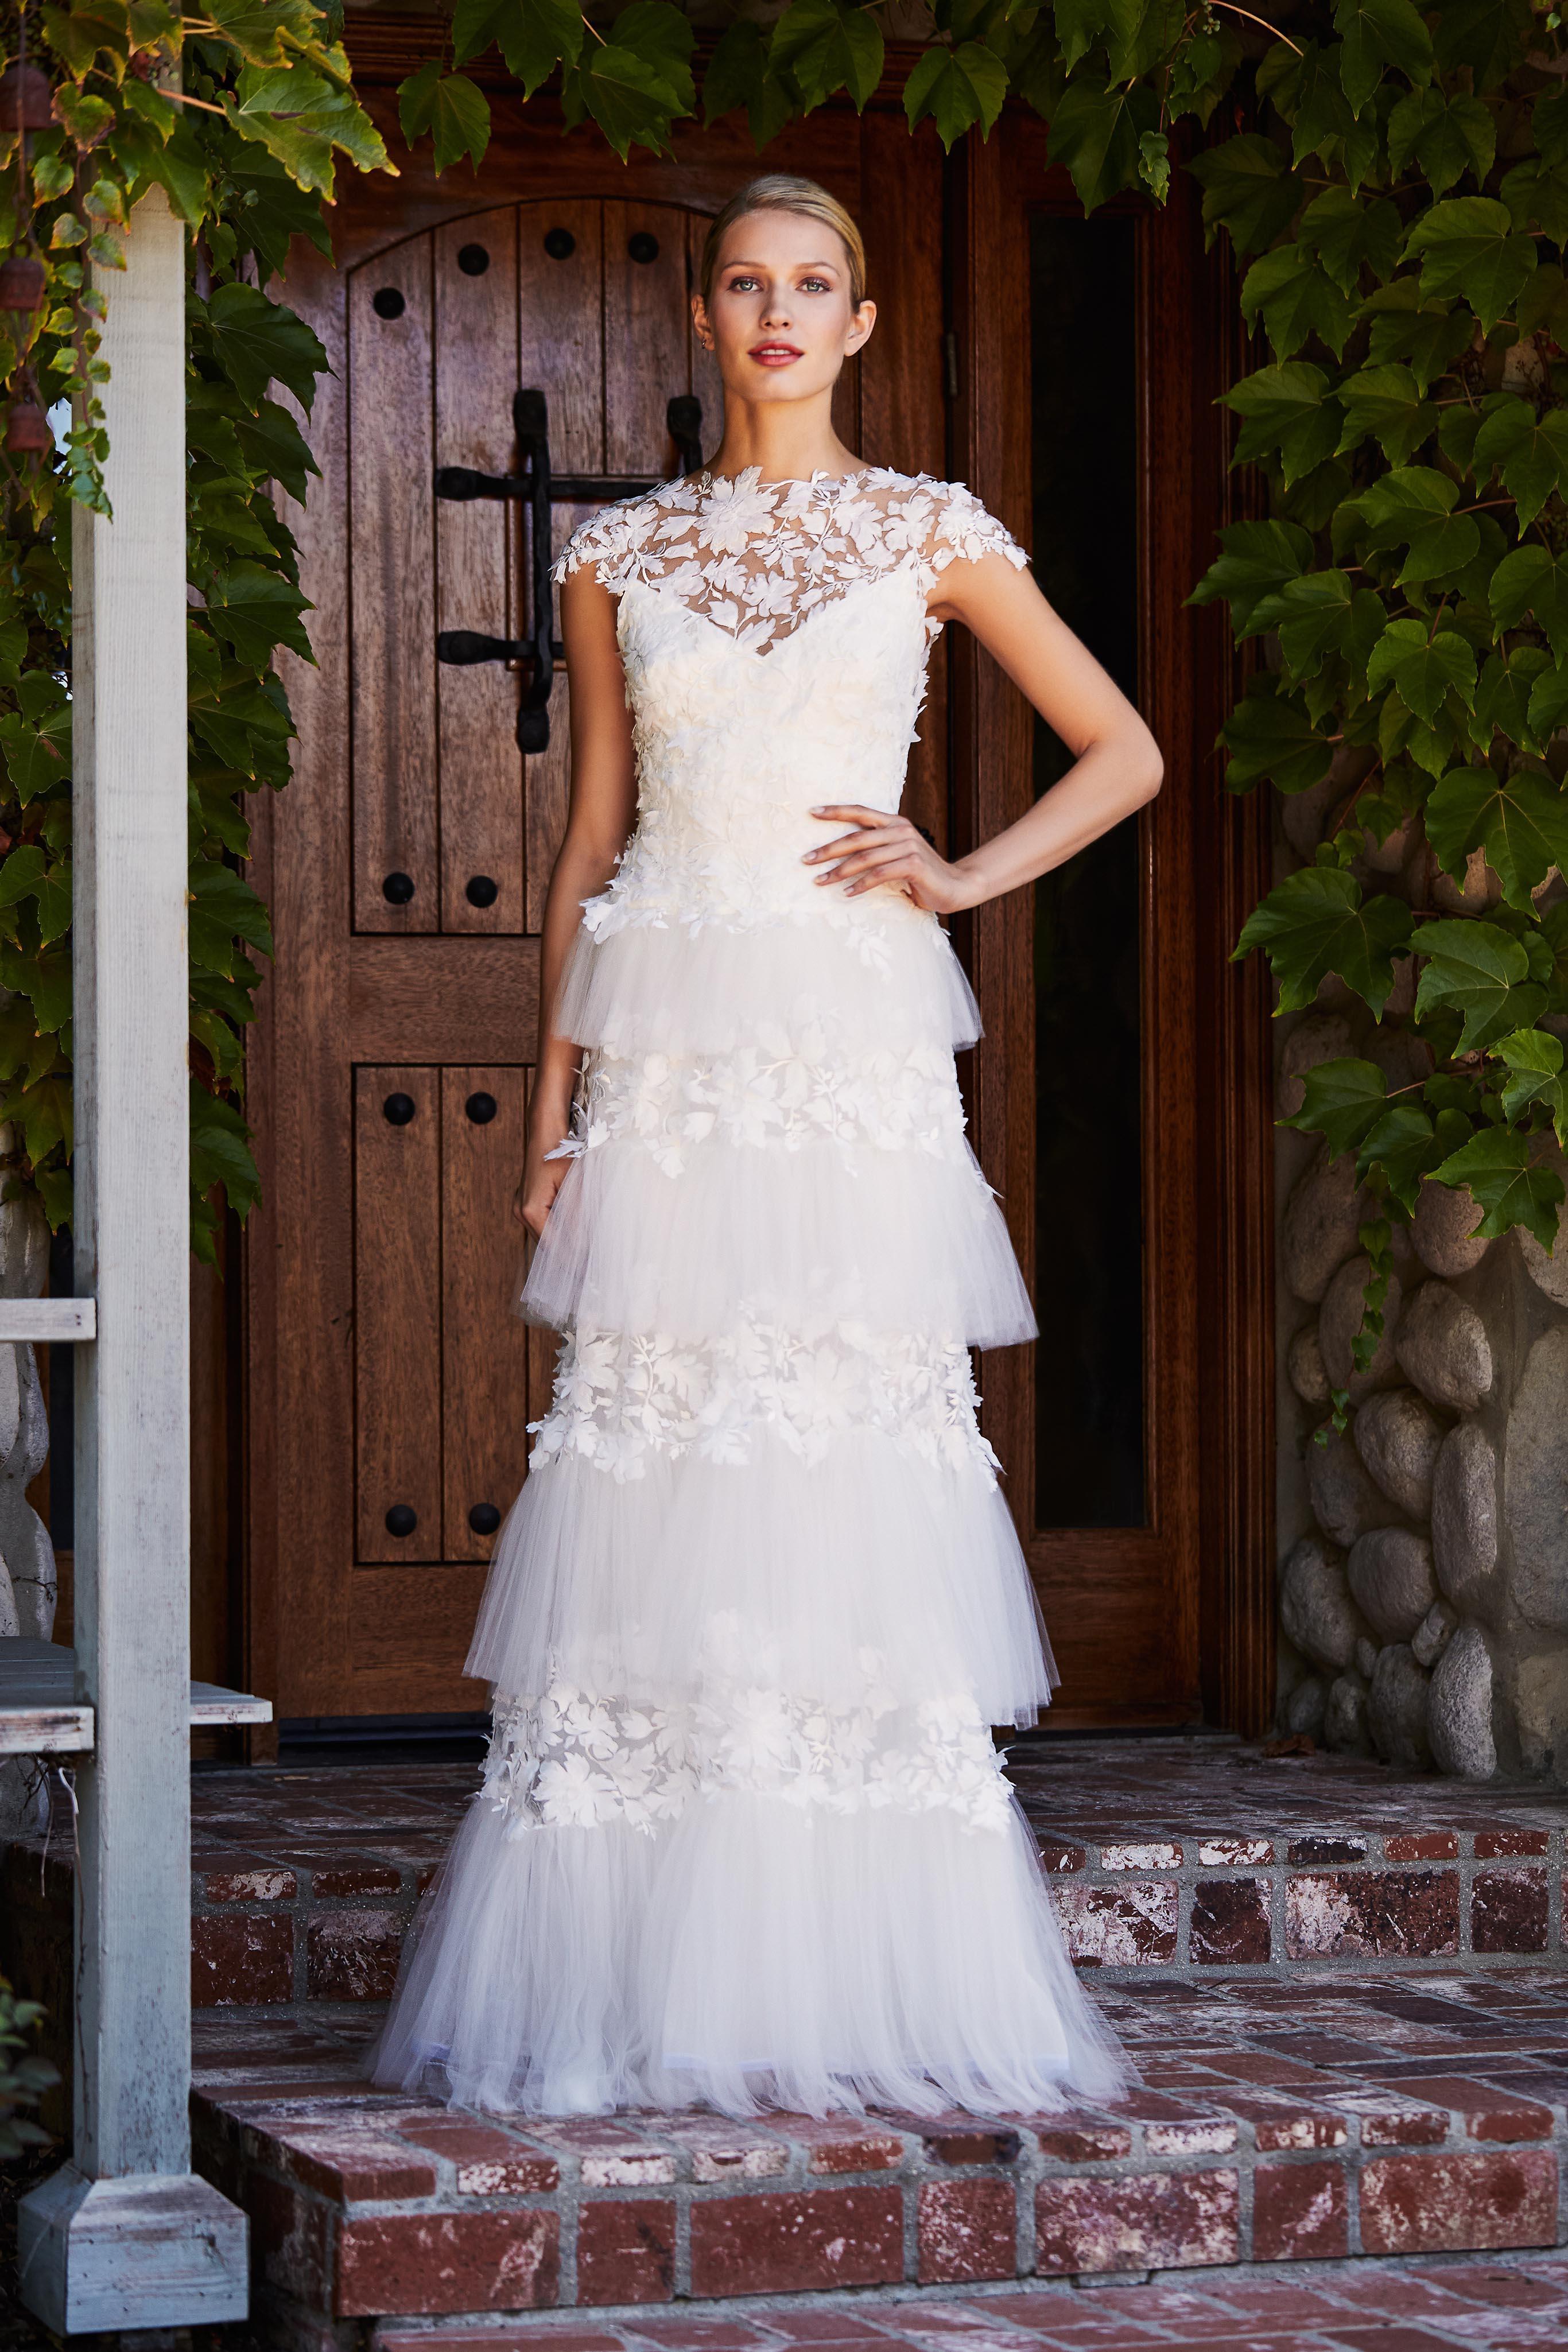 tadashi shoji wedding dress fall 2018 tiered tulle high neck